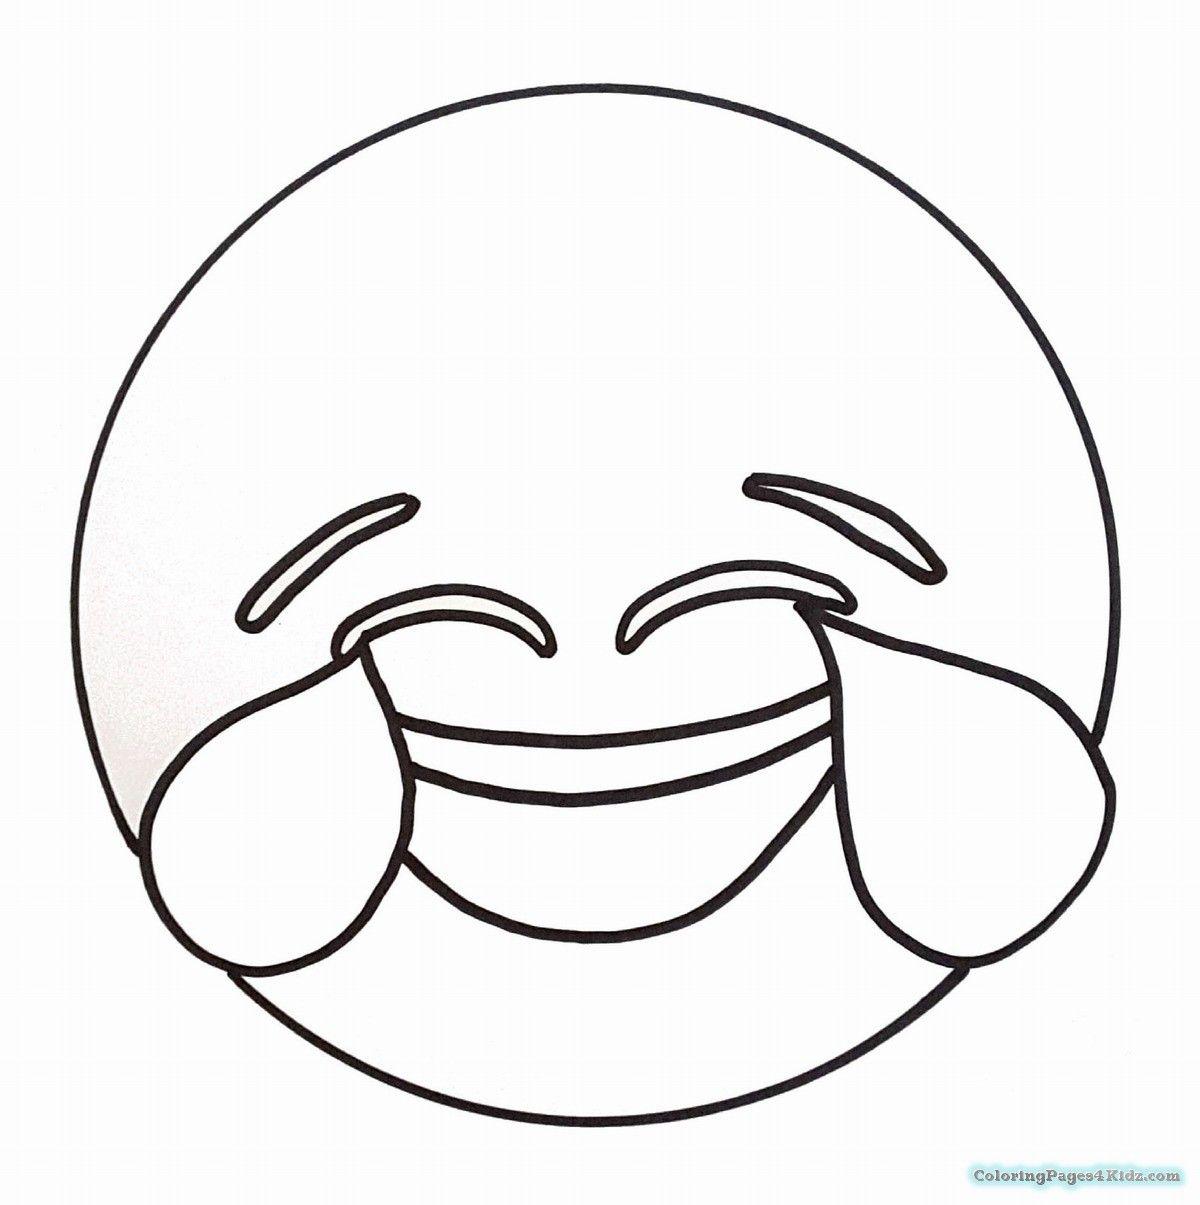 Emoji coloring pages sketch coloring page